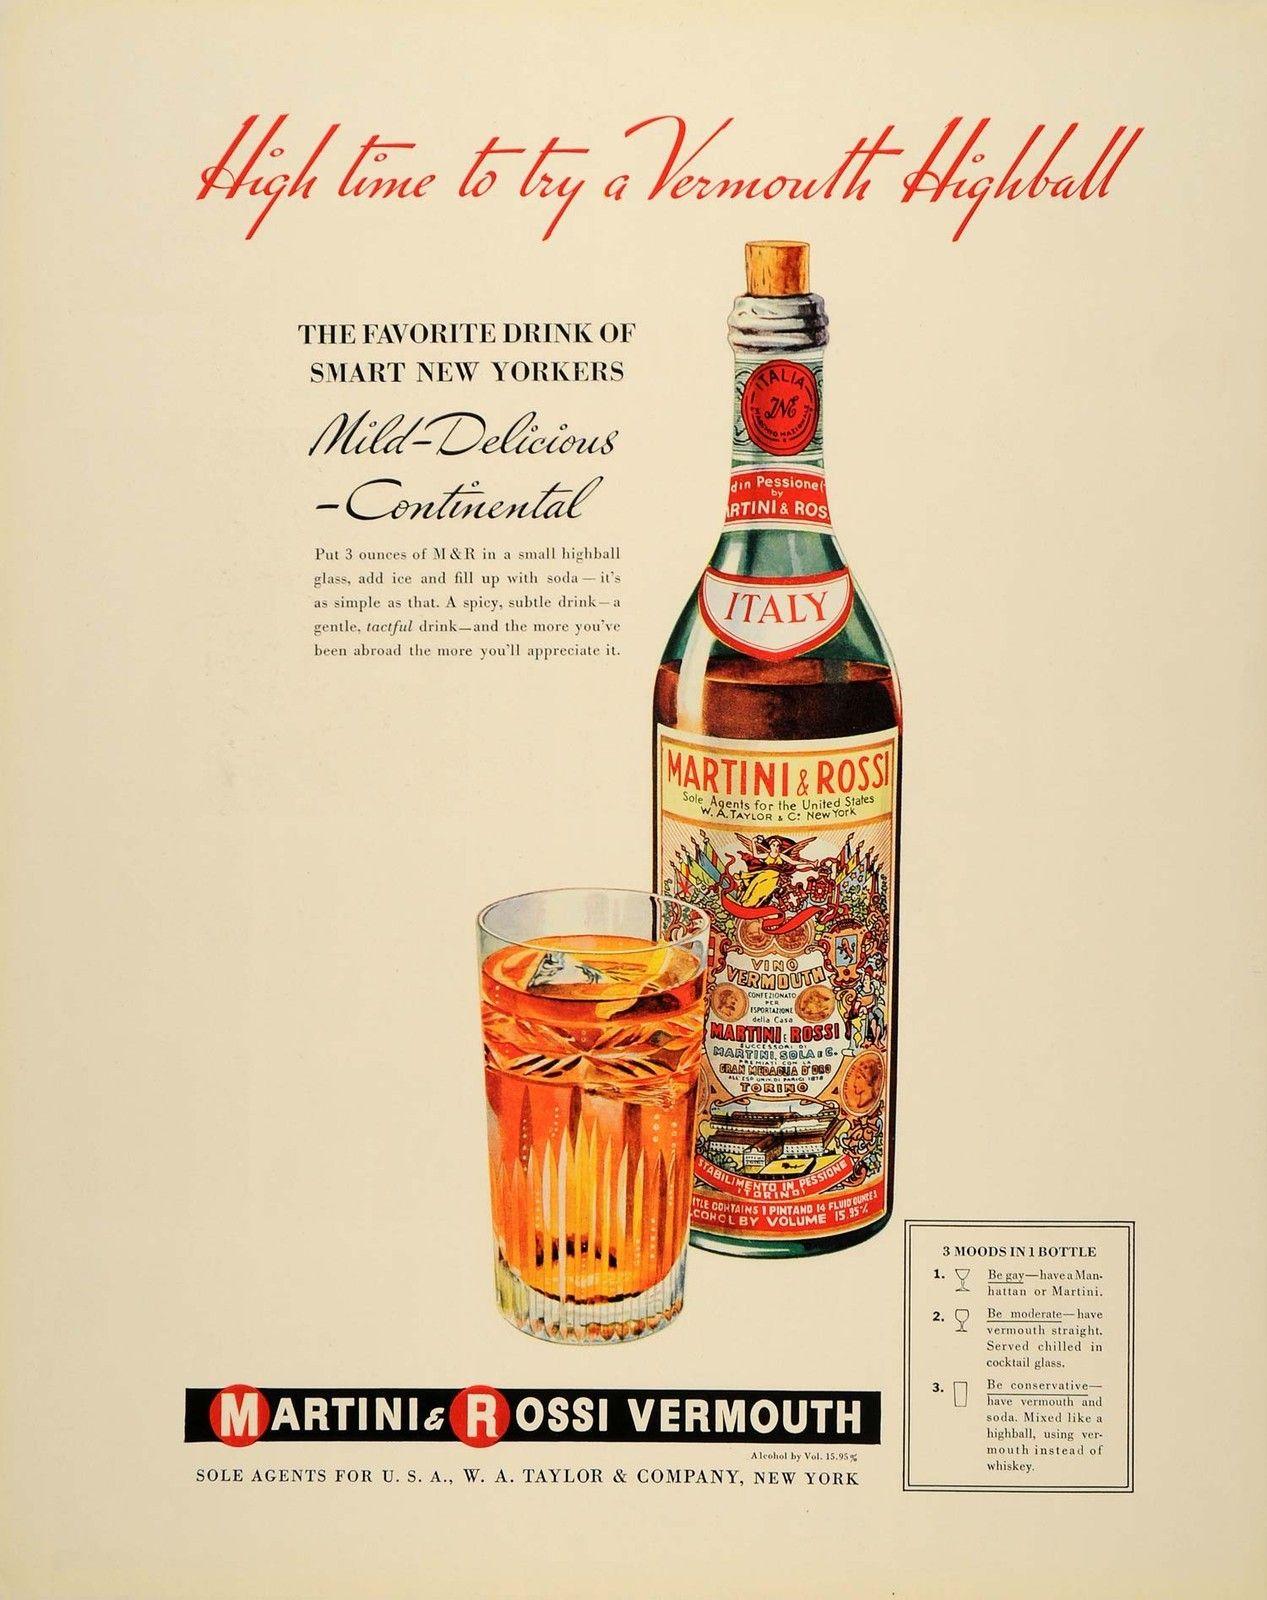 Martini & Rossi Vermouth Vintage Ad martini vermouth